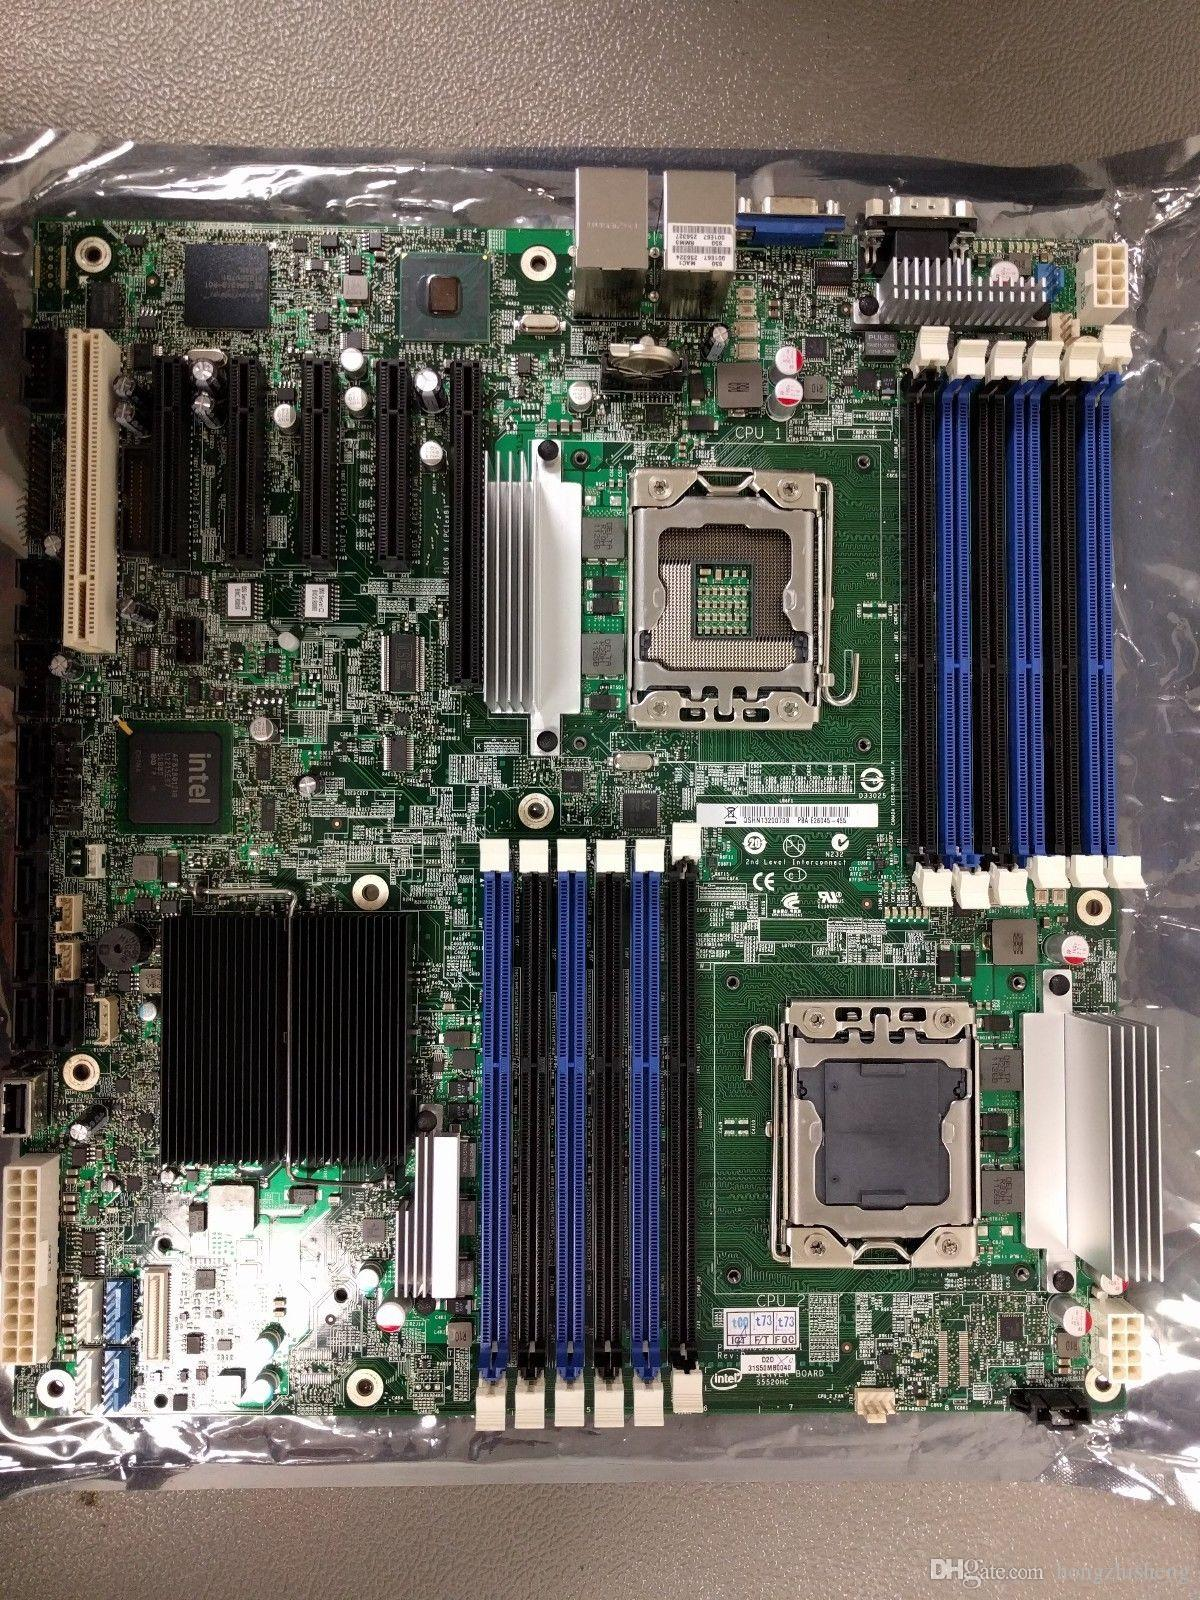 Envío rápido S5520HC Integrated Xeon LGA1366 x58 para Intel S5520HC Original Dual LGA1366 SATA DDR3 Server System Board